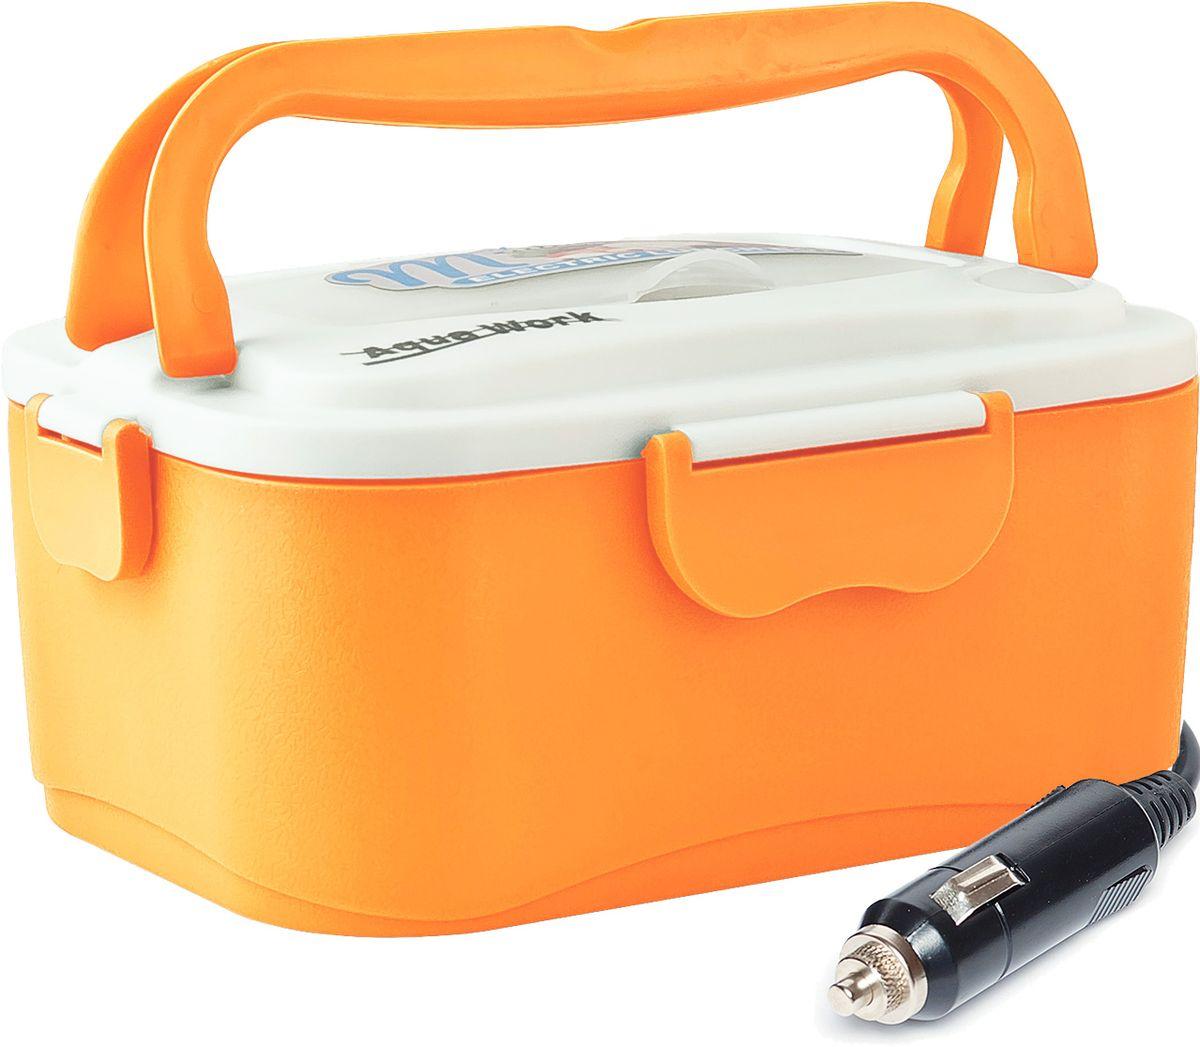 Aqua Work С5, Orange ланч-бокс с подогревом 1,5 л